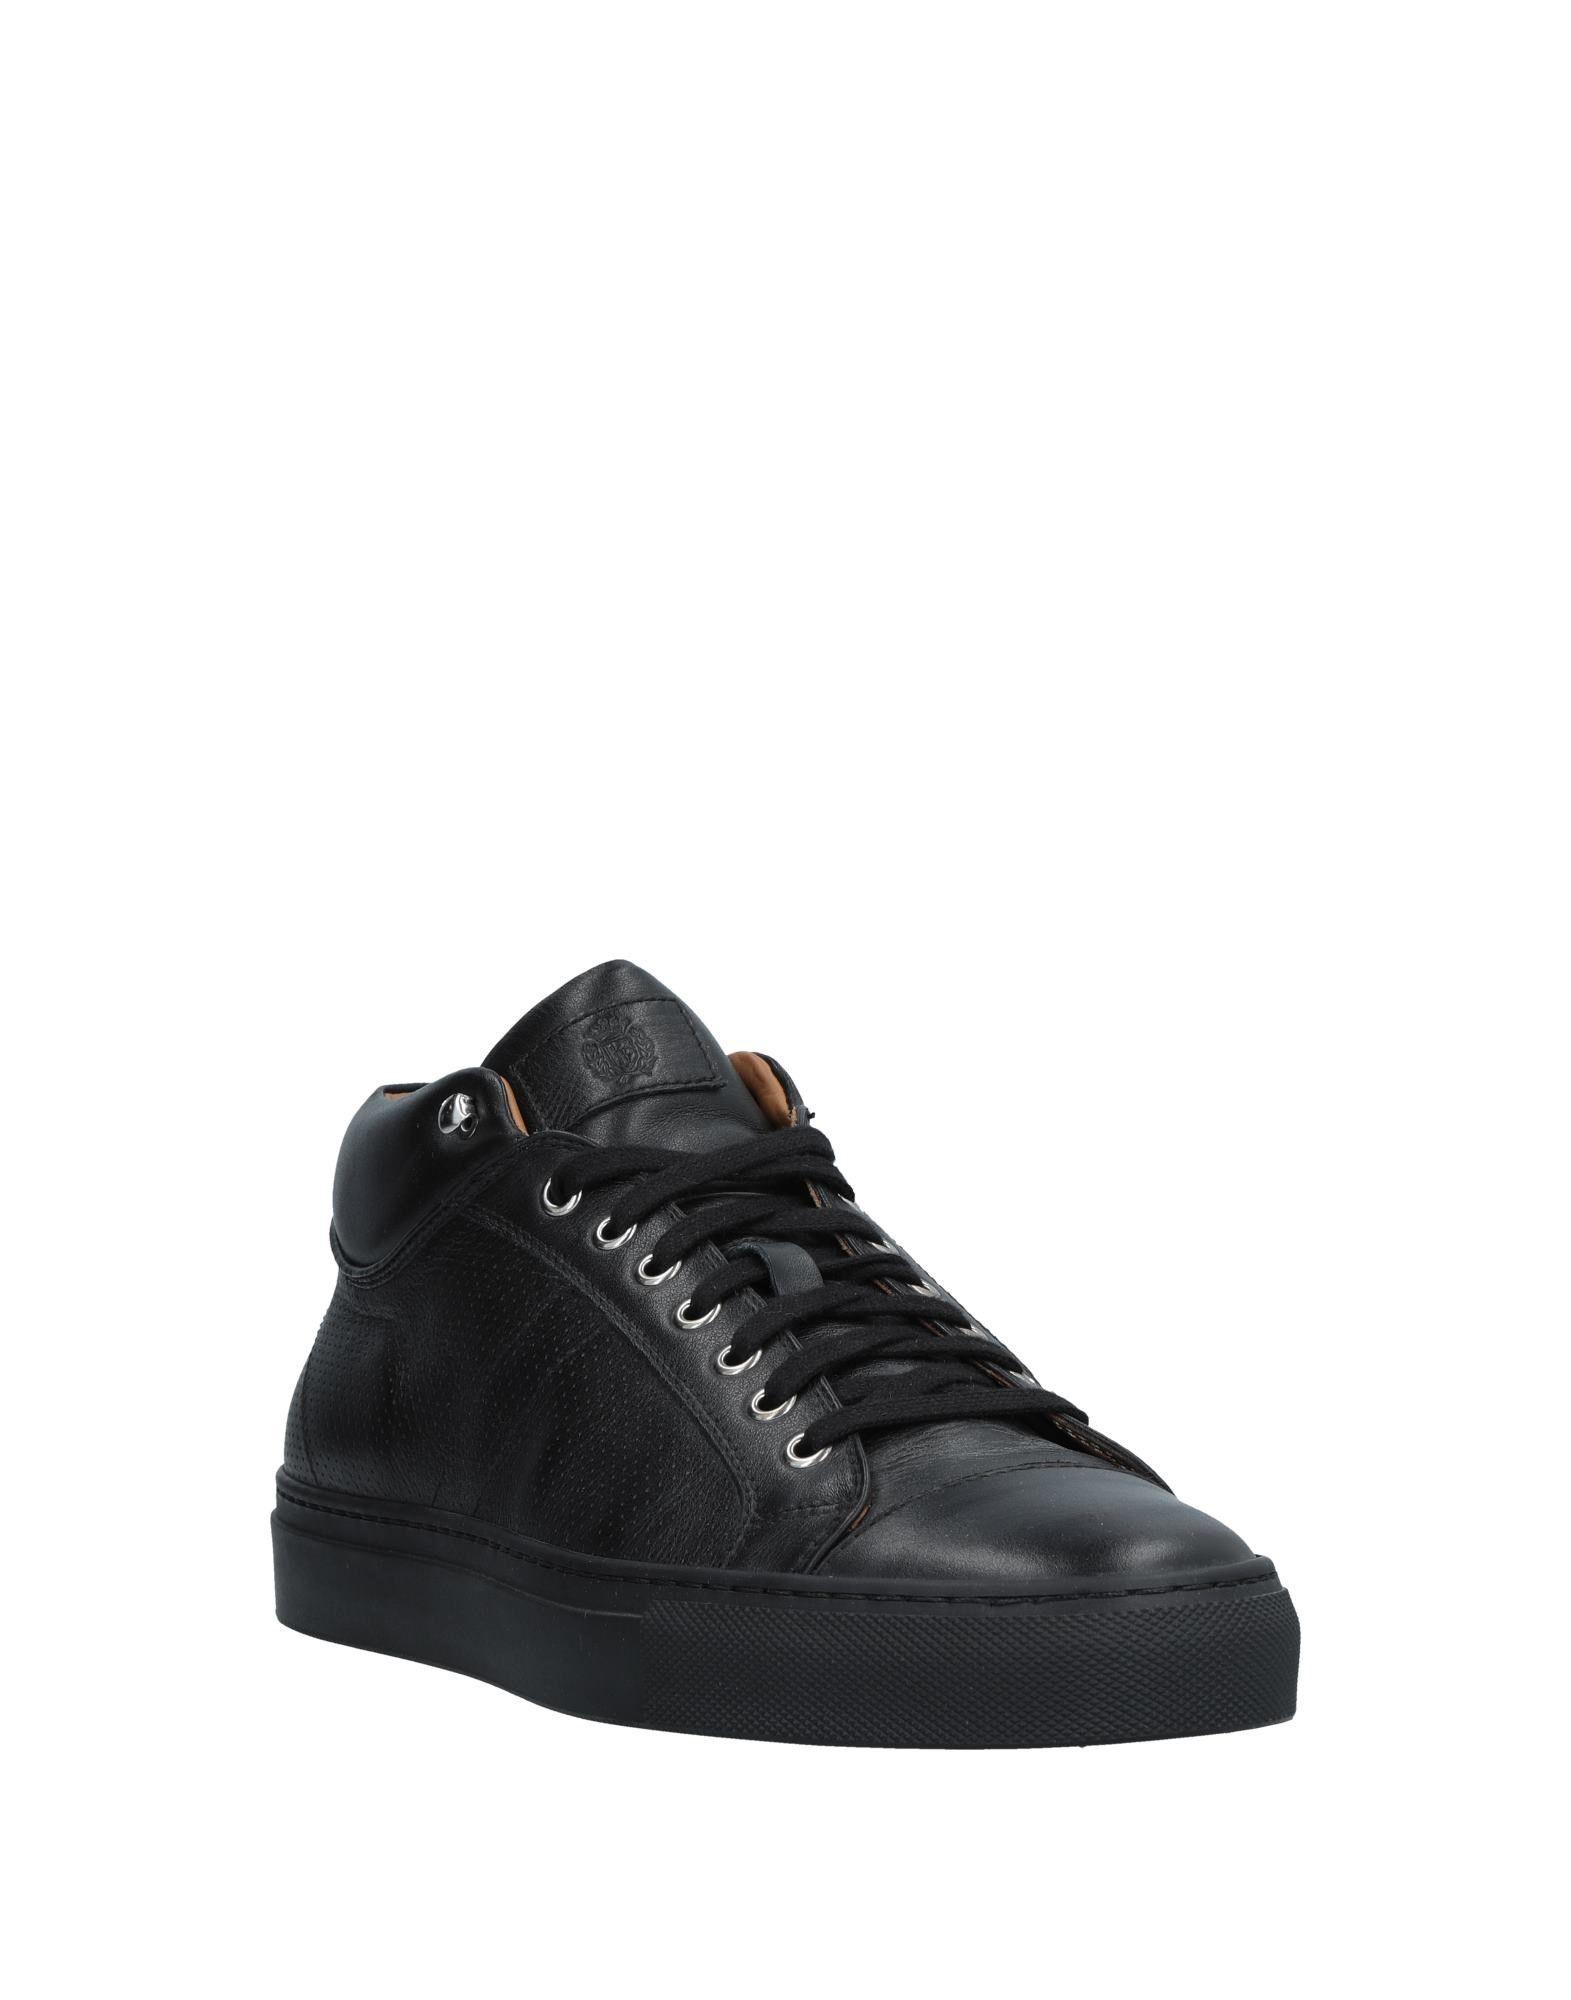 Pellettieri Di    Parma Sneakers - Men Pellettieri Di  Parma Sneakers online on  Australia - 11530351WC d59849